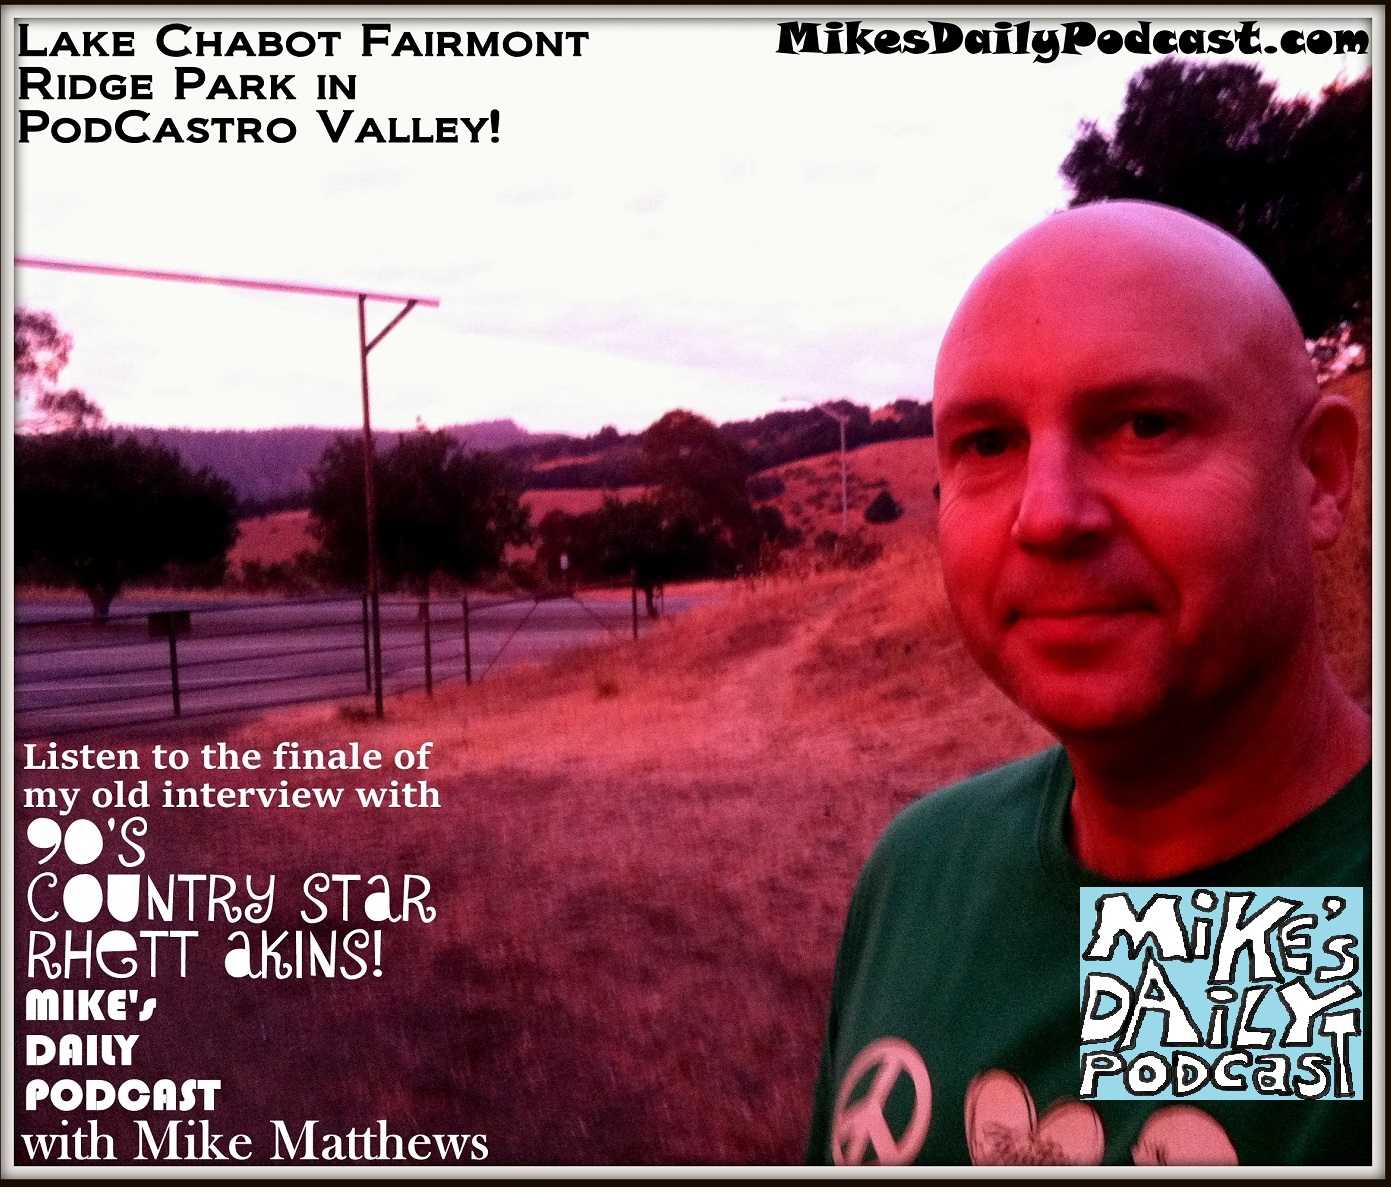 MIKEs DAILY PODCAST 942 Fairmont Ridge Lake Chabot Blvd